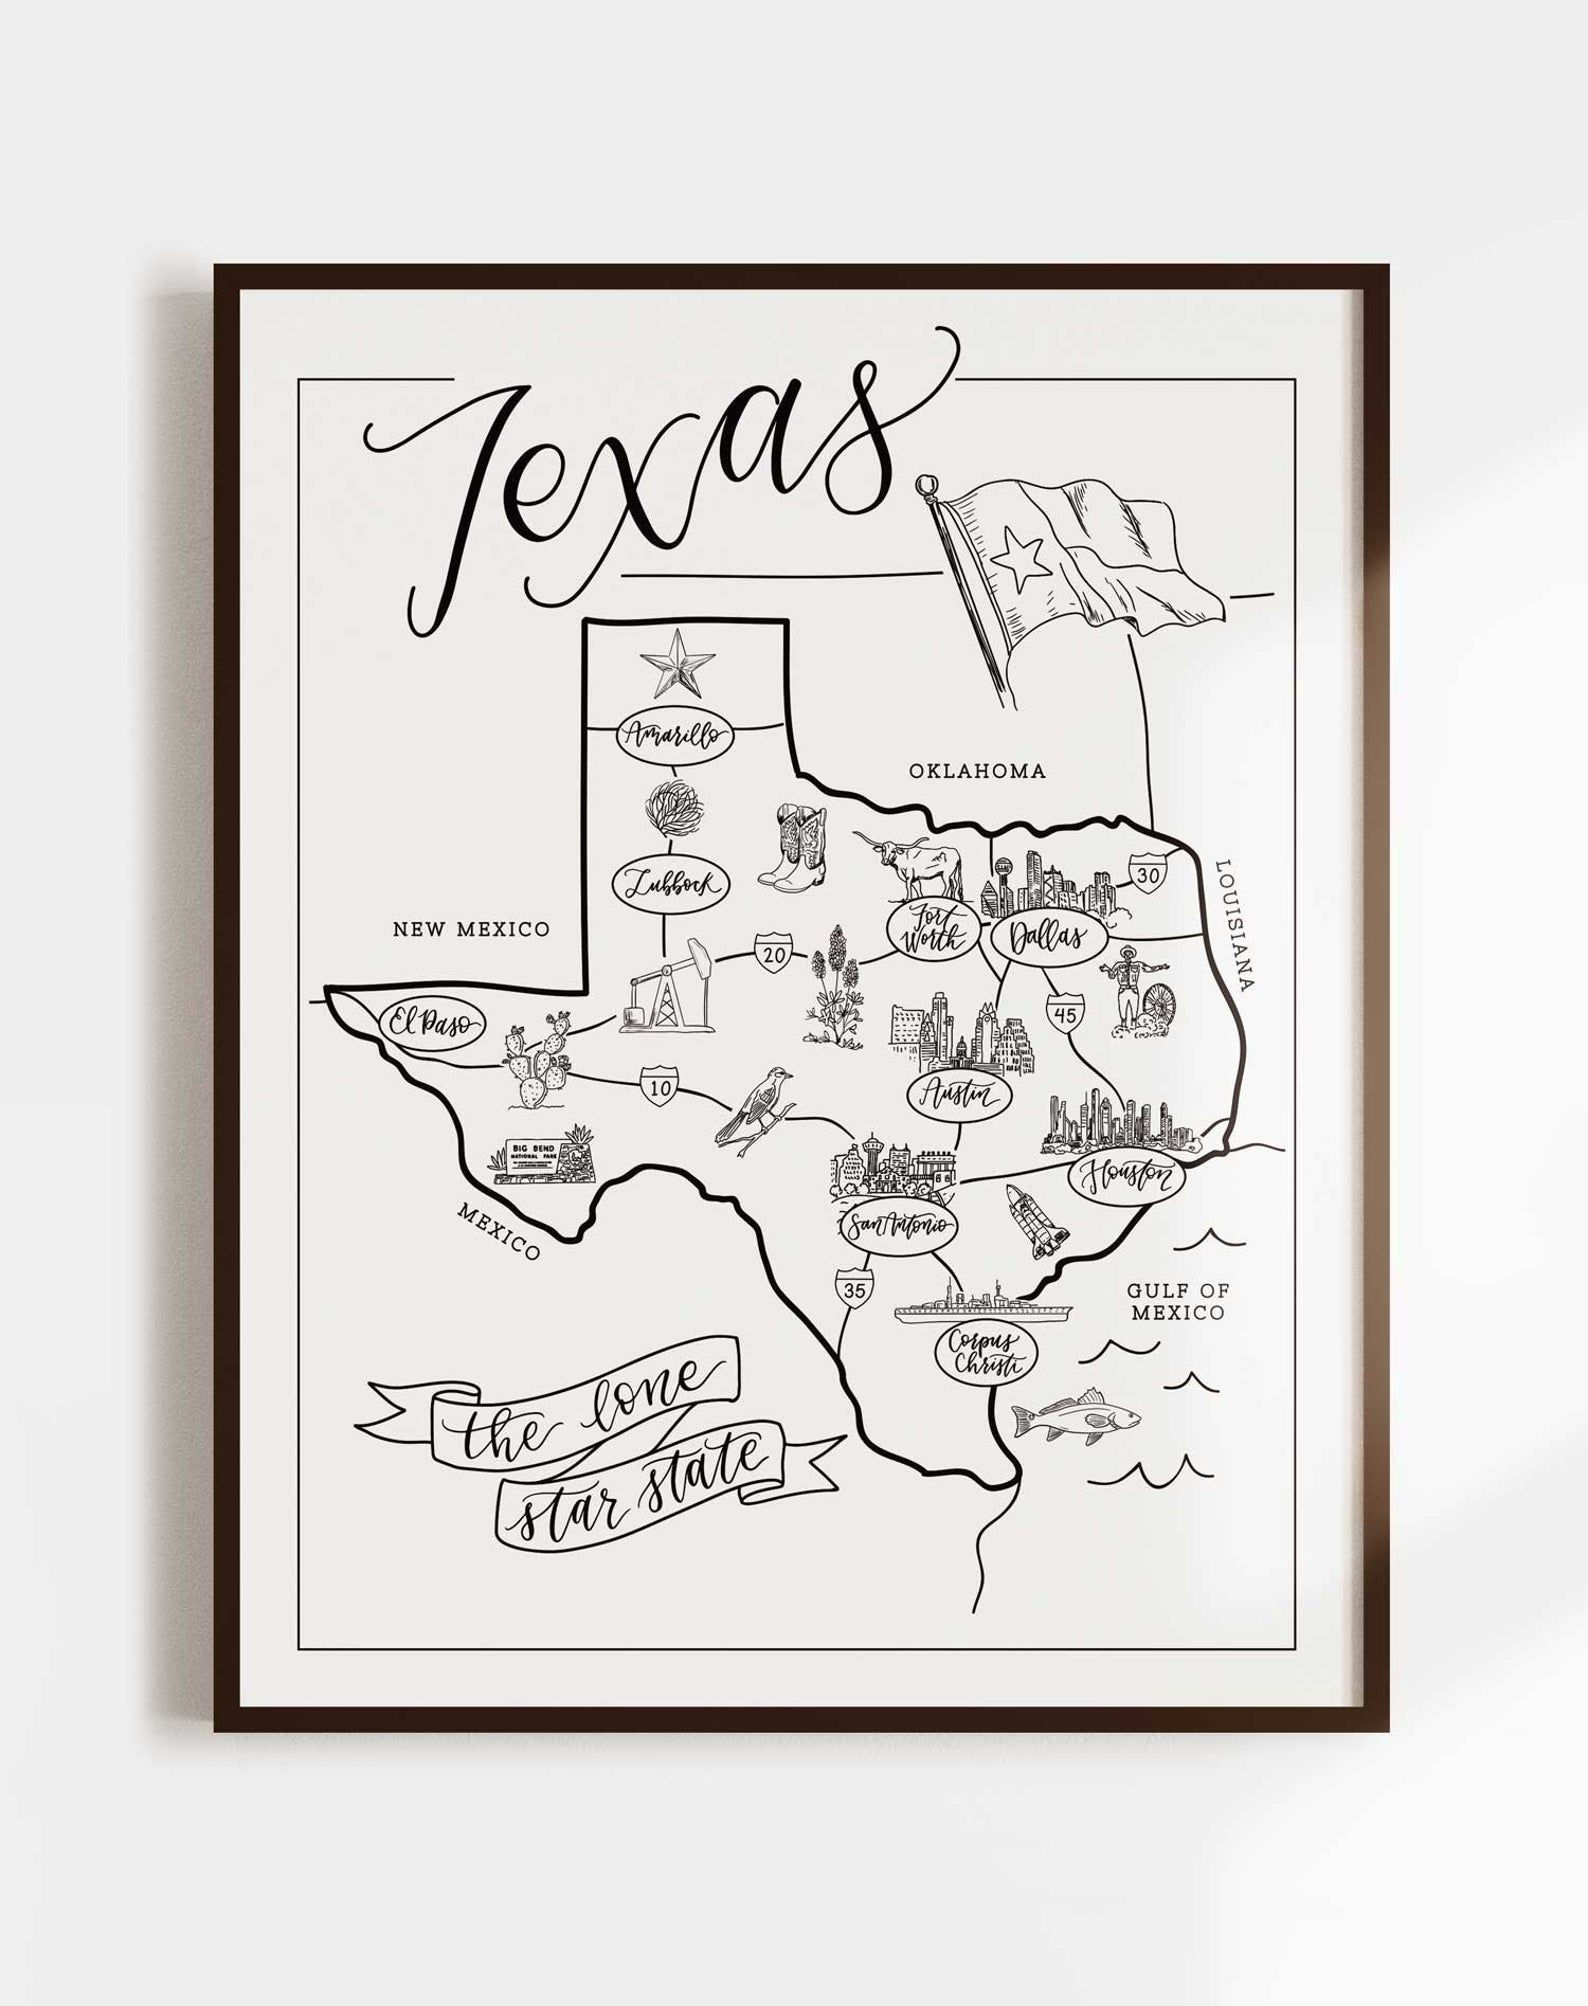 Texas Illustrated Map Texas Wall Art Print Nursery Decor Etsy In 2020 Texas Wall Art Illustrated Map Hand Illustration